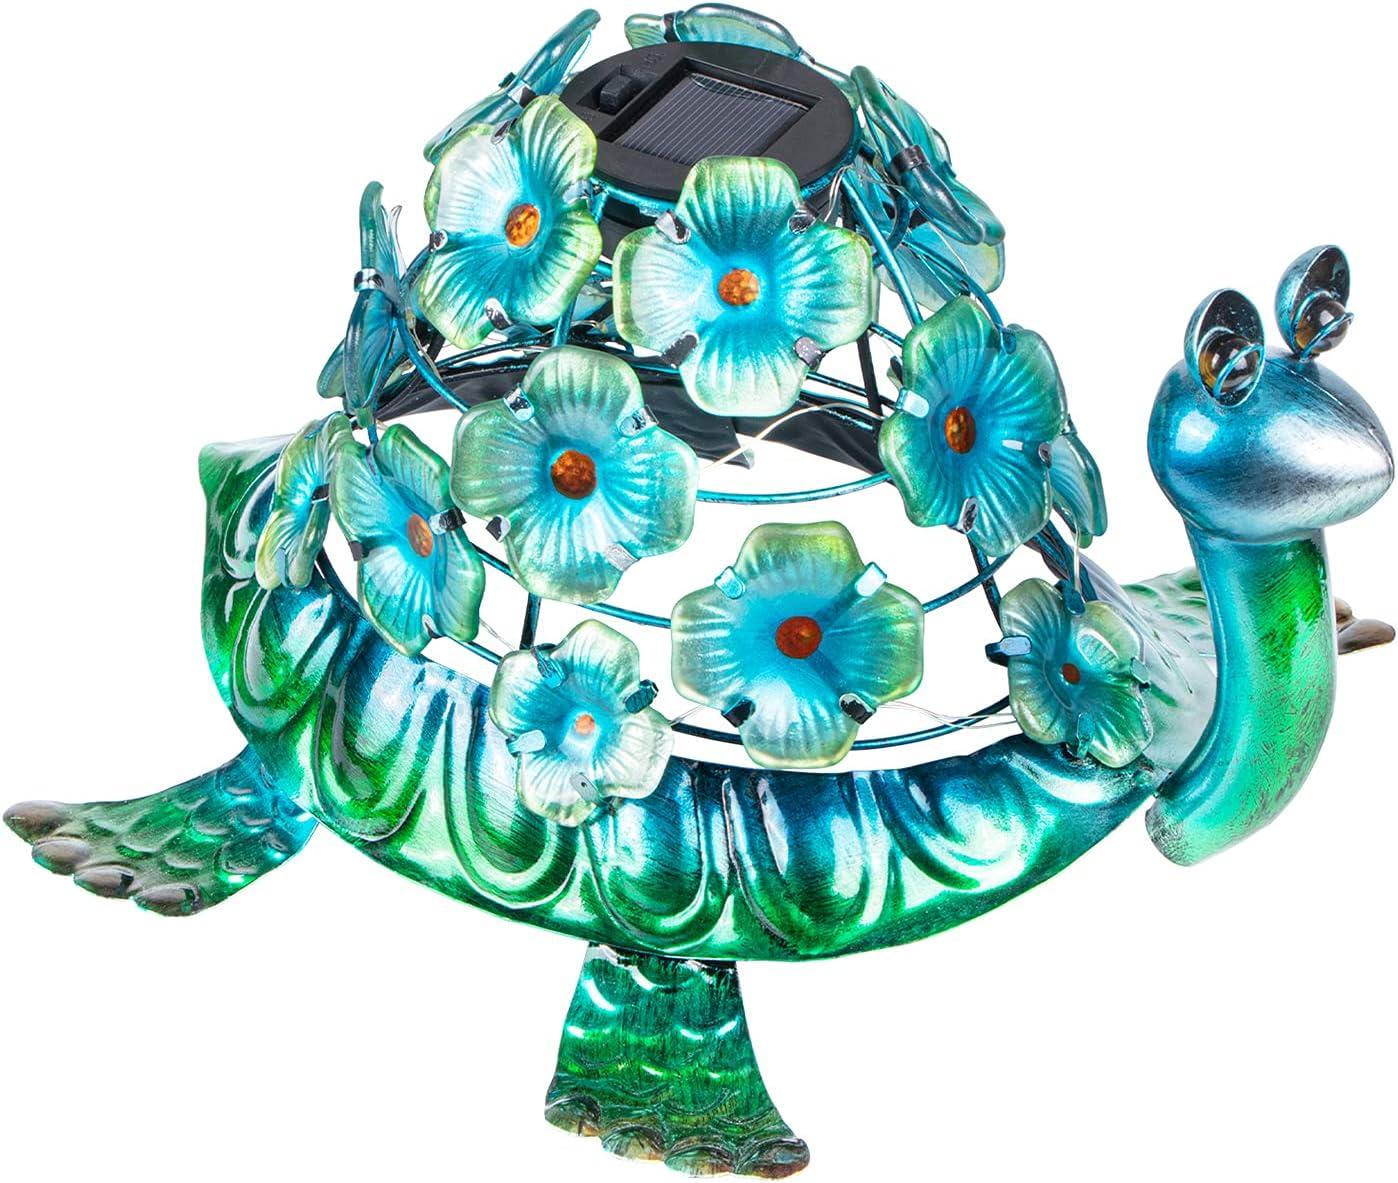 VCUTEKA Solar Light Outdoor Waterproof - Metal Turtle Floral Solar LED Lights Garden Figurine Light for Patio Lawn Yard Decor, Ideal Gift